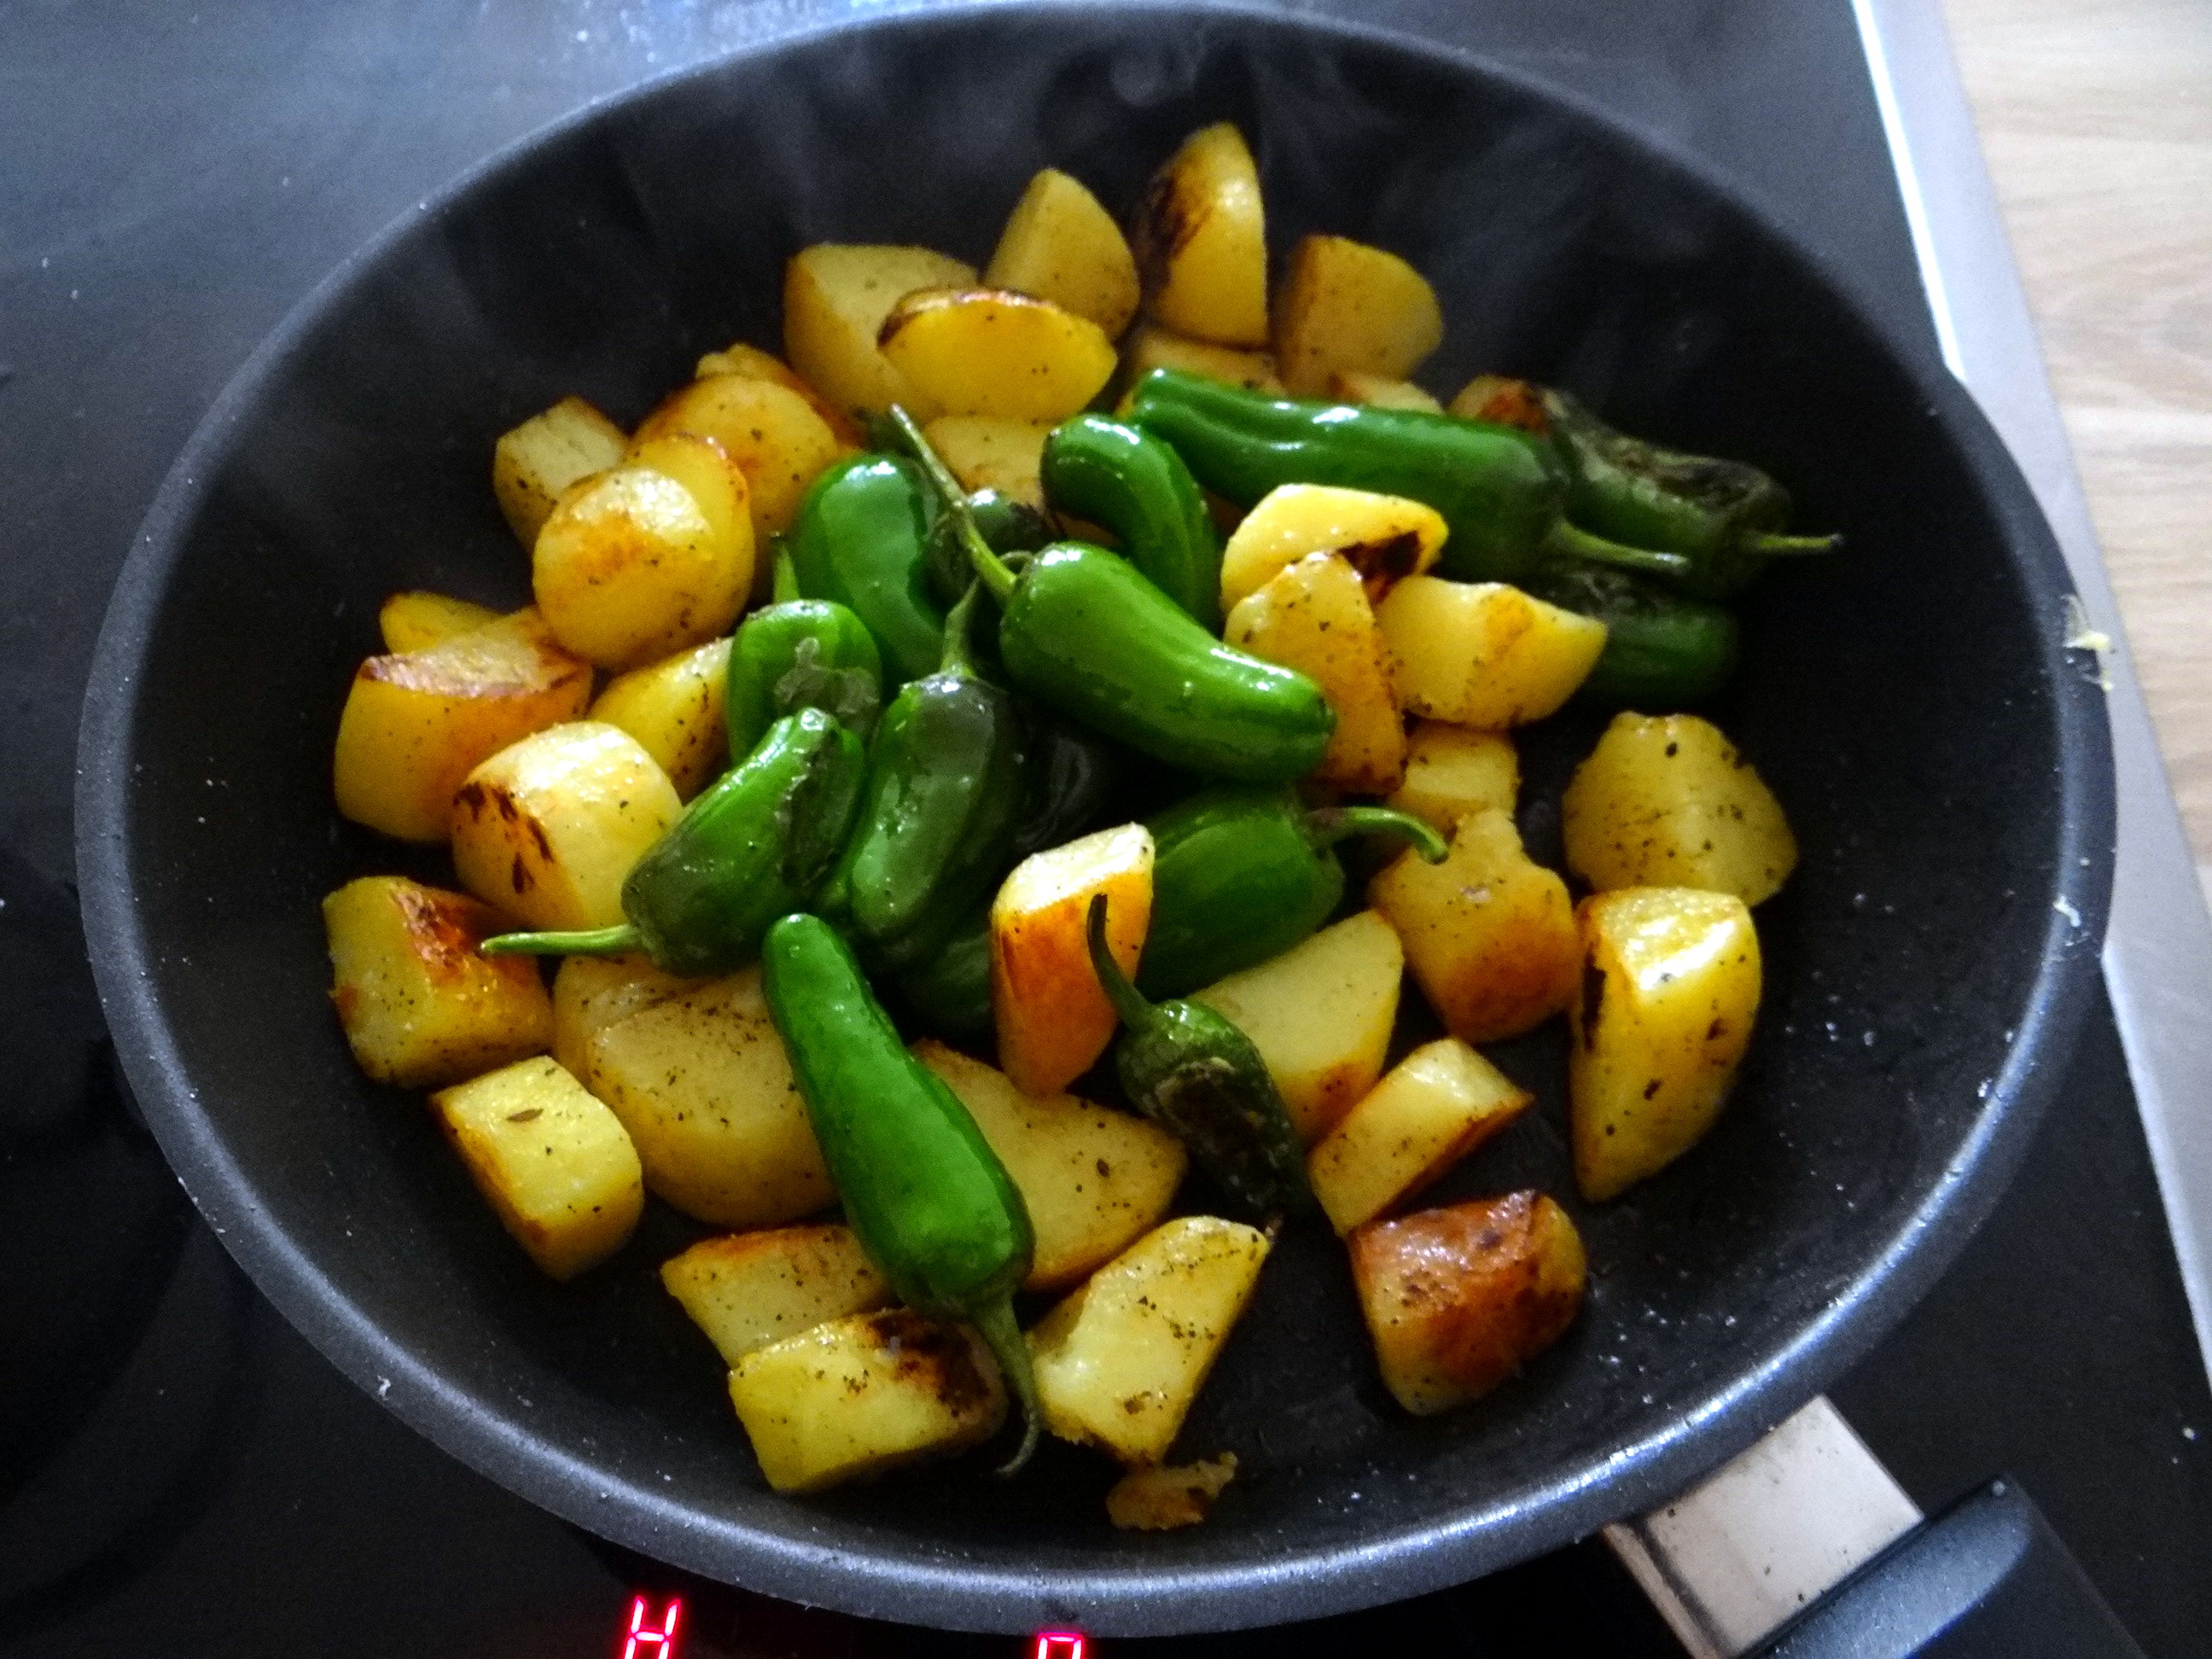 Fritierte Portobello,Bratkartoffeln,Pimientos,Salat,vegan (13)